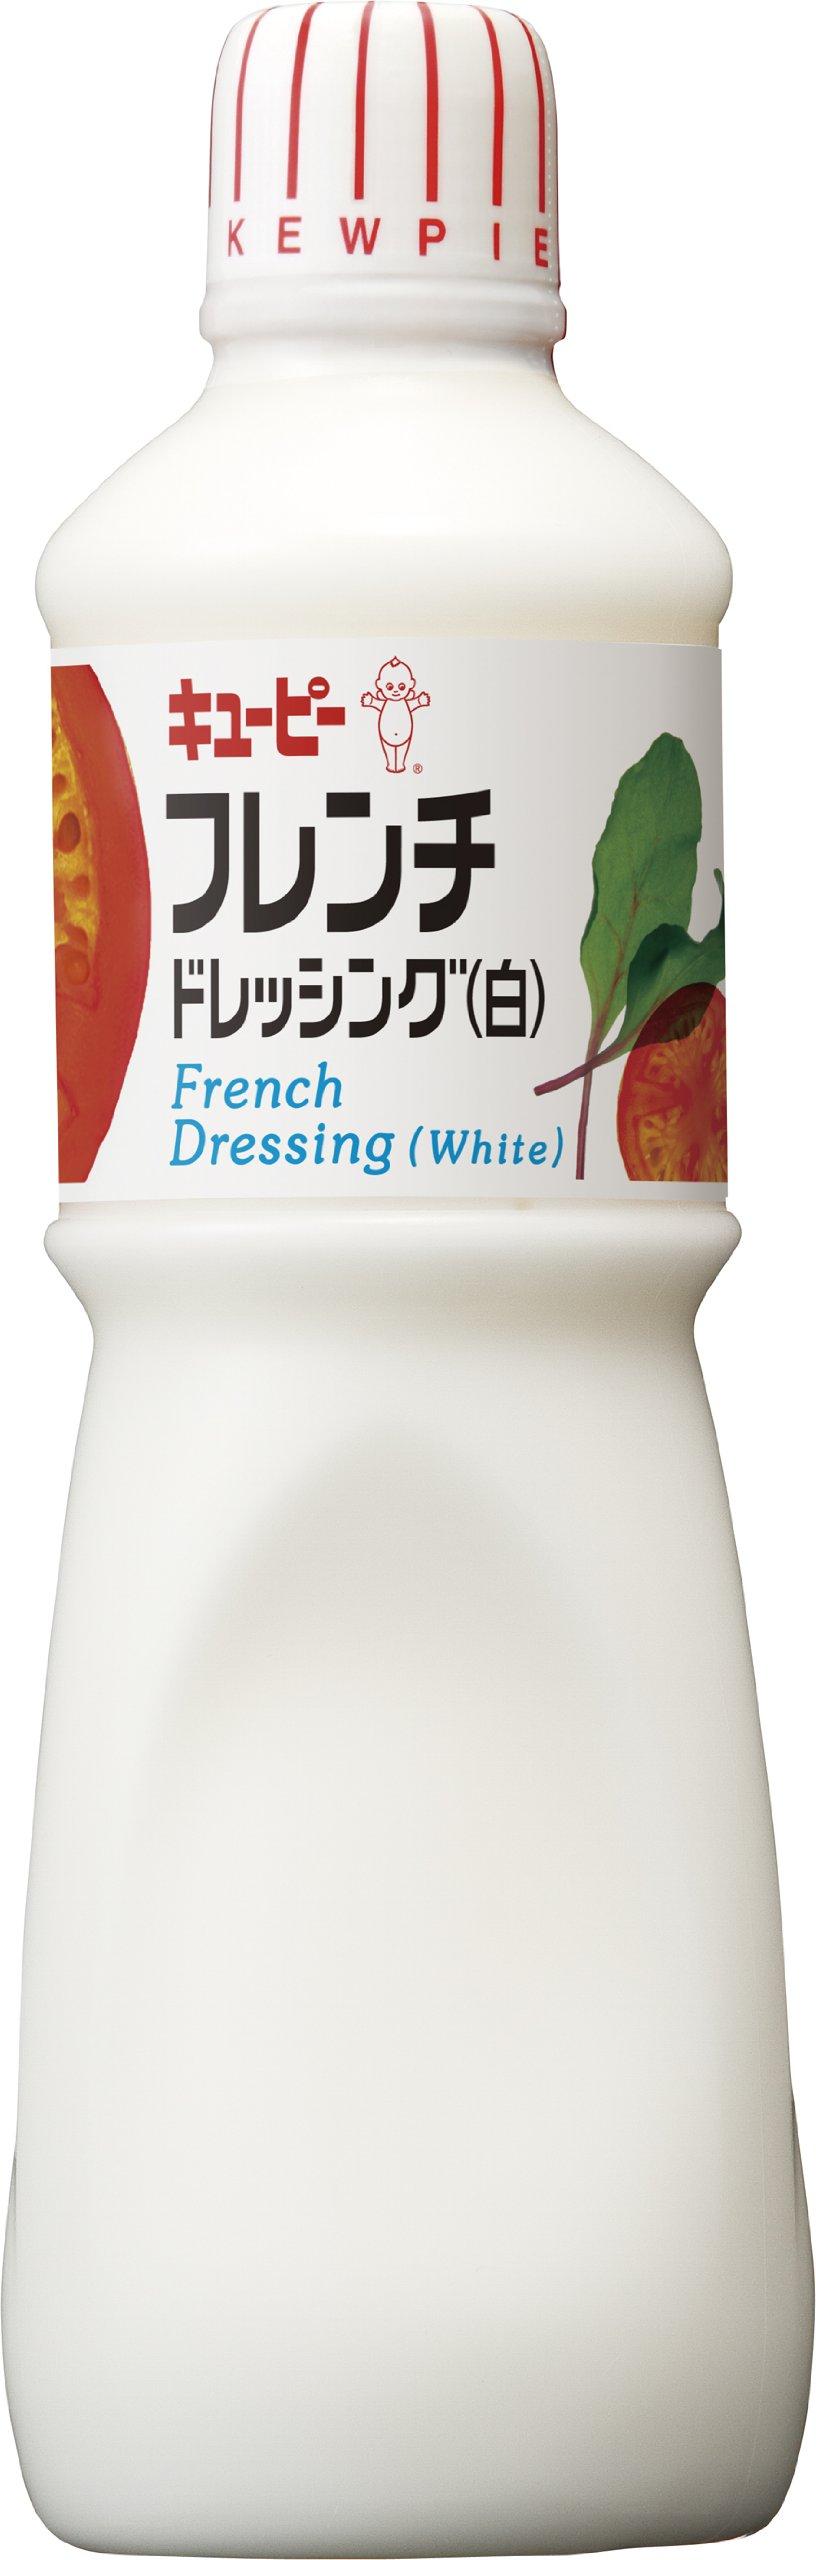 Kewpie French dressing (white) 1L